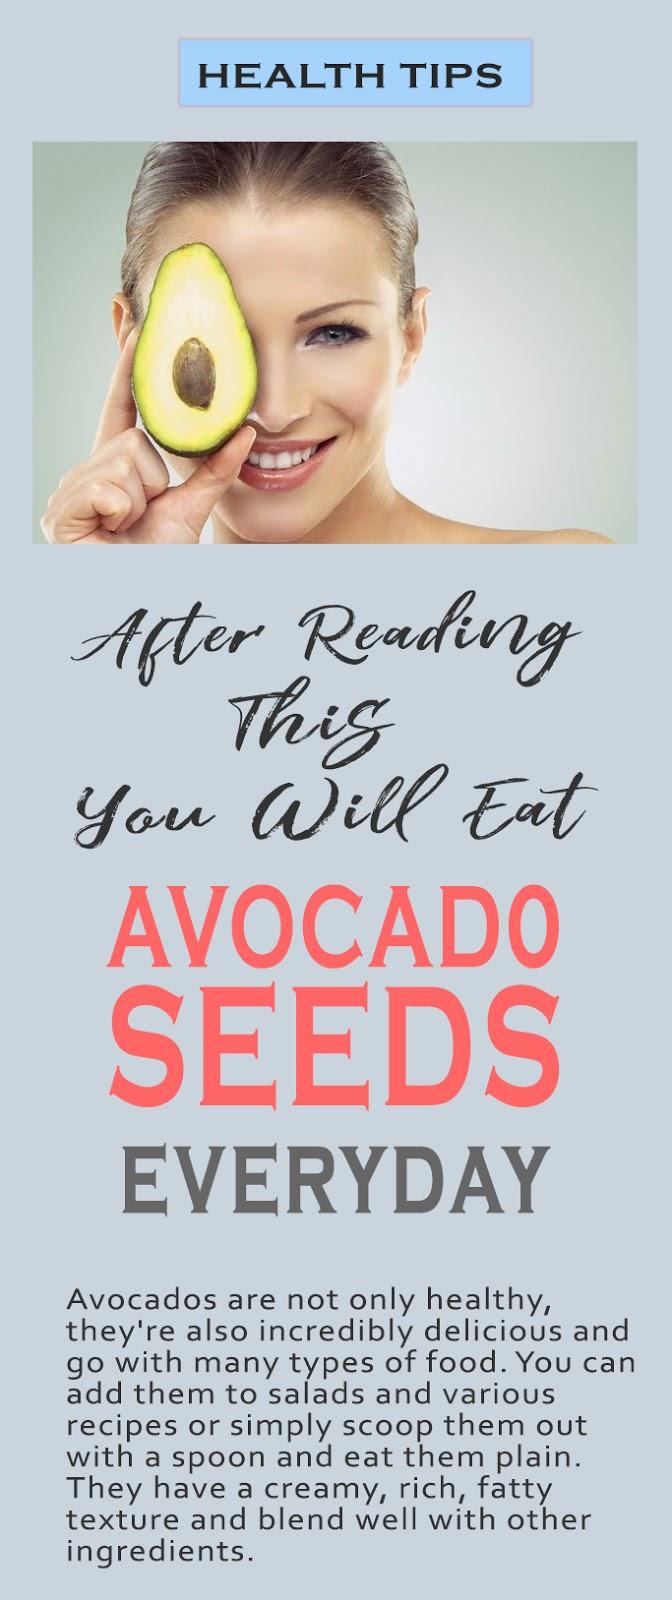 12 Proven Health Benefits of Avocado